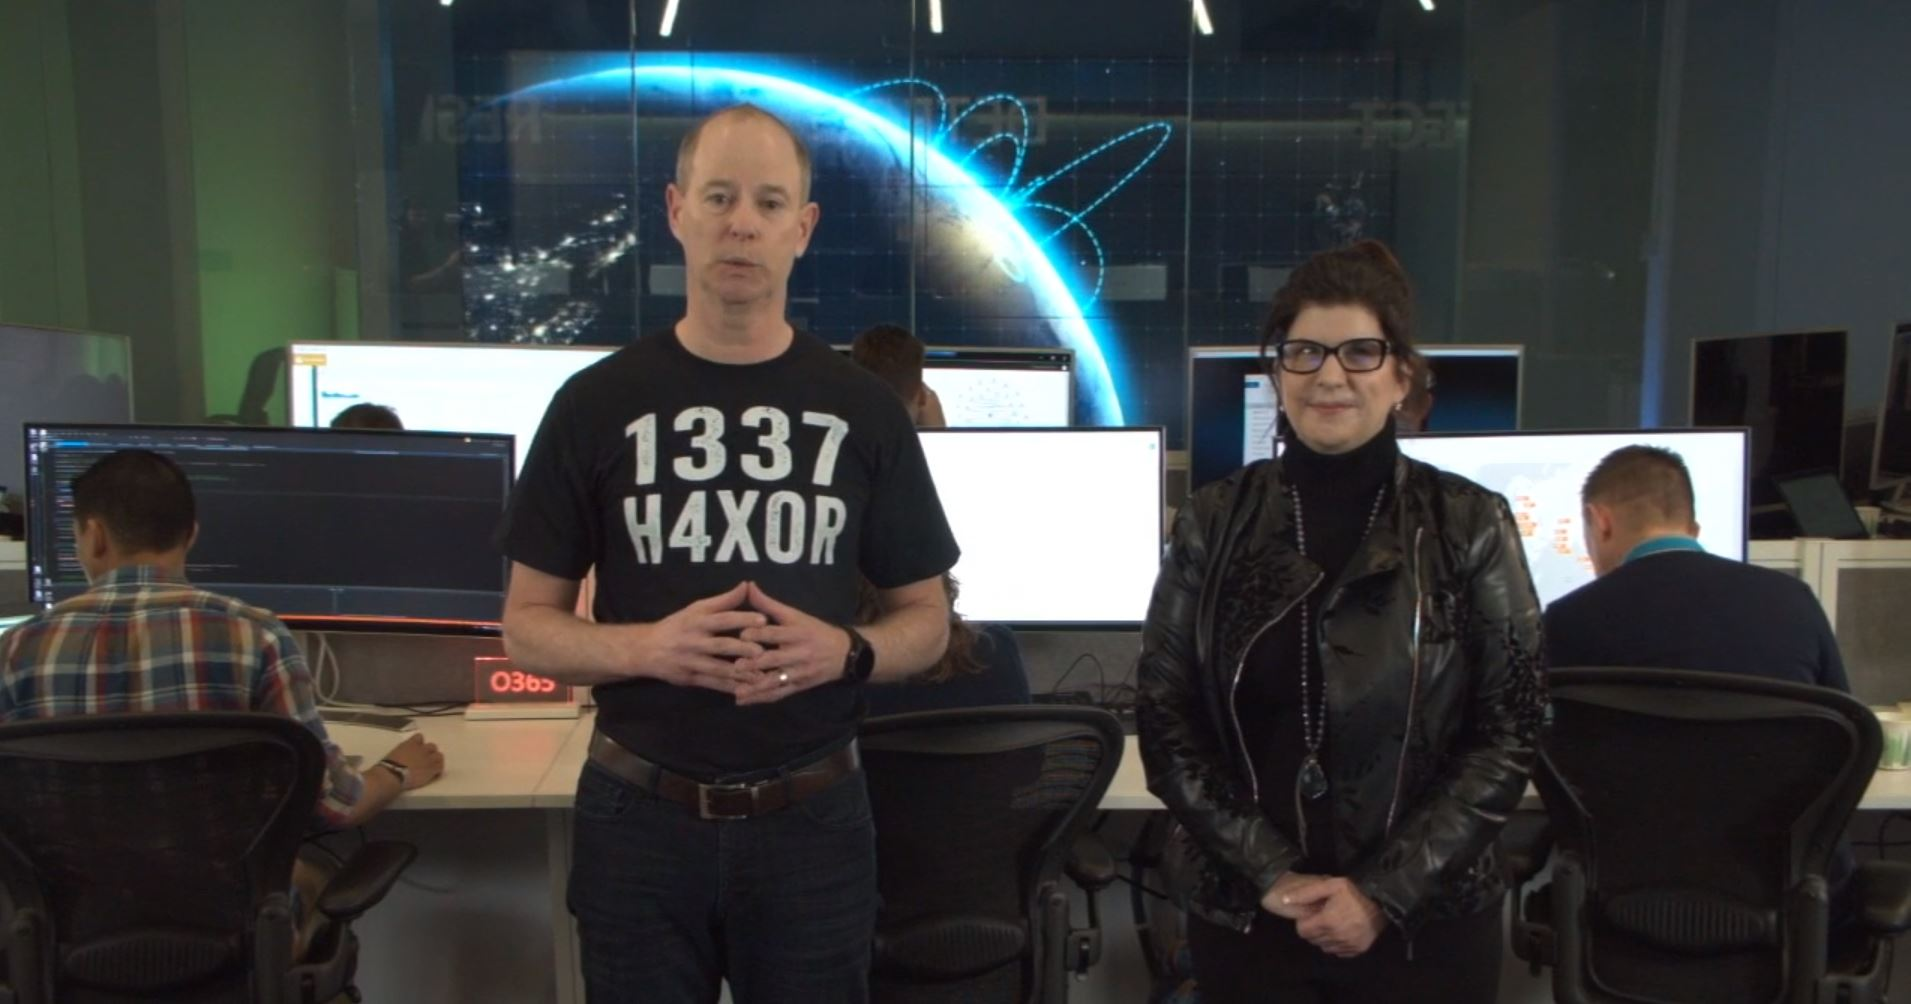 Microsoft CVPs Frank X. Shaw and Ann Johnson